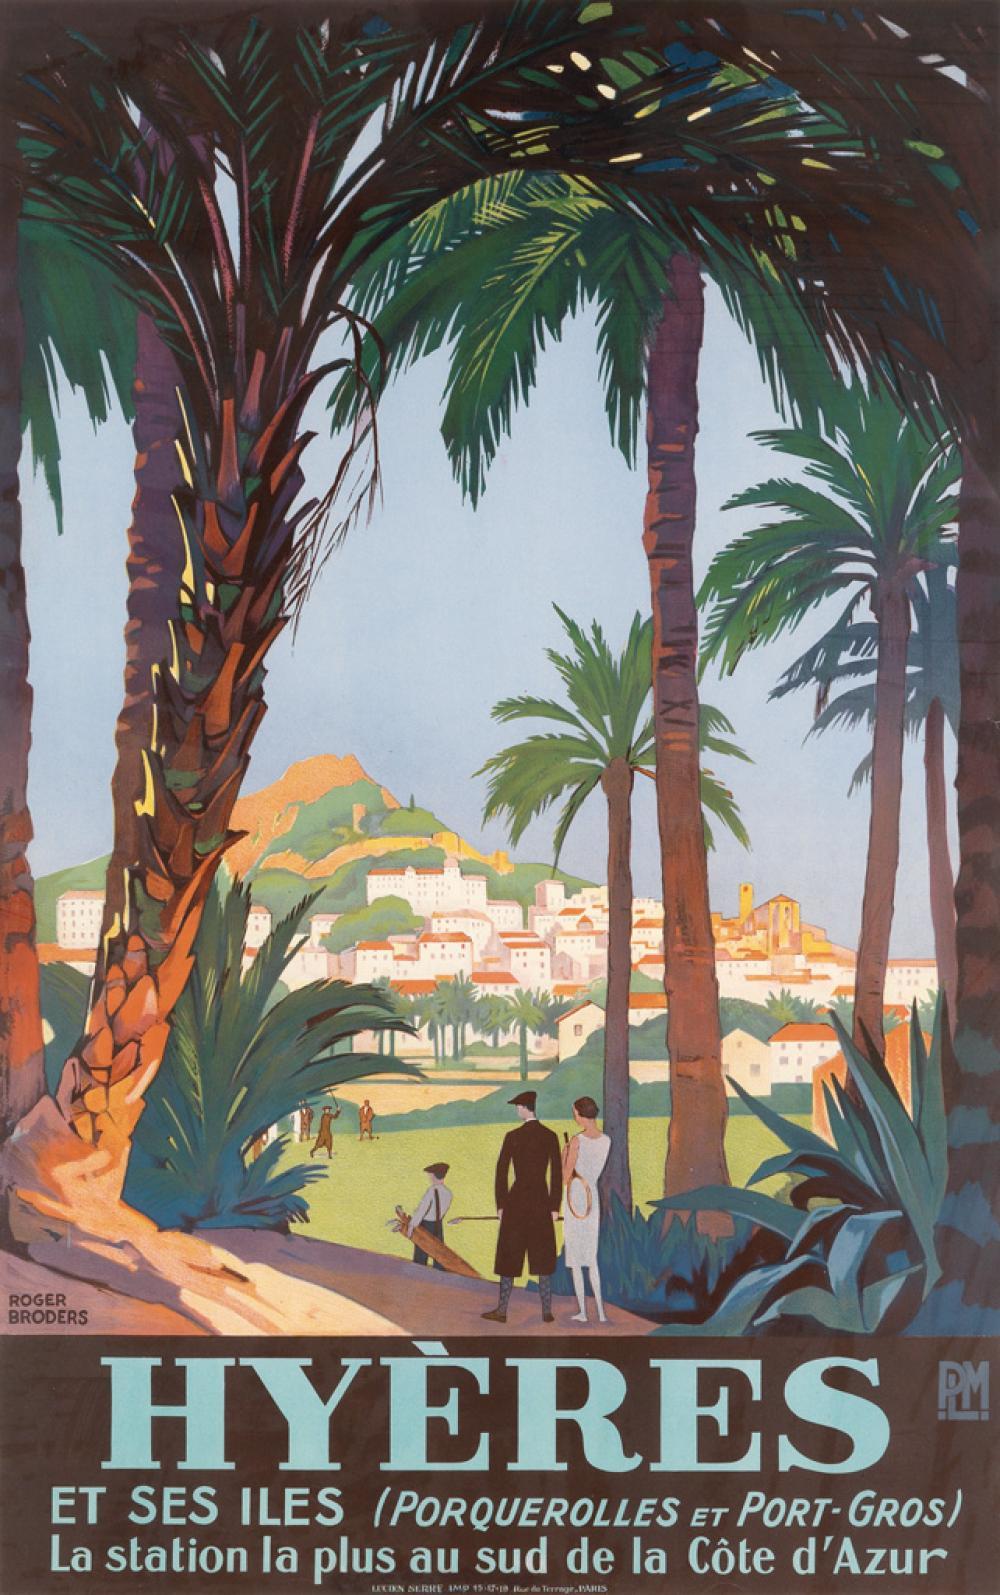 ROGER BRODERS (1883-1953). HYÈRES. Circa 1931. 39x24 inches, 99x62 cm. Lucien Serre, Paris.